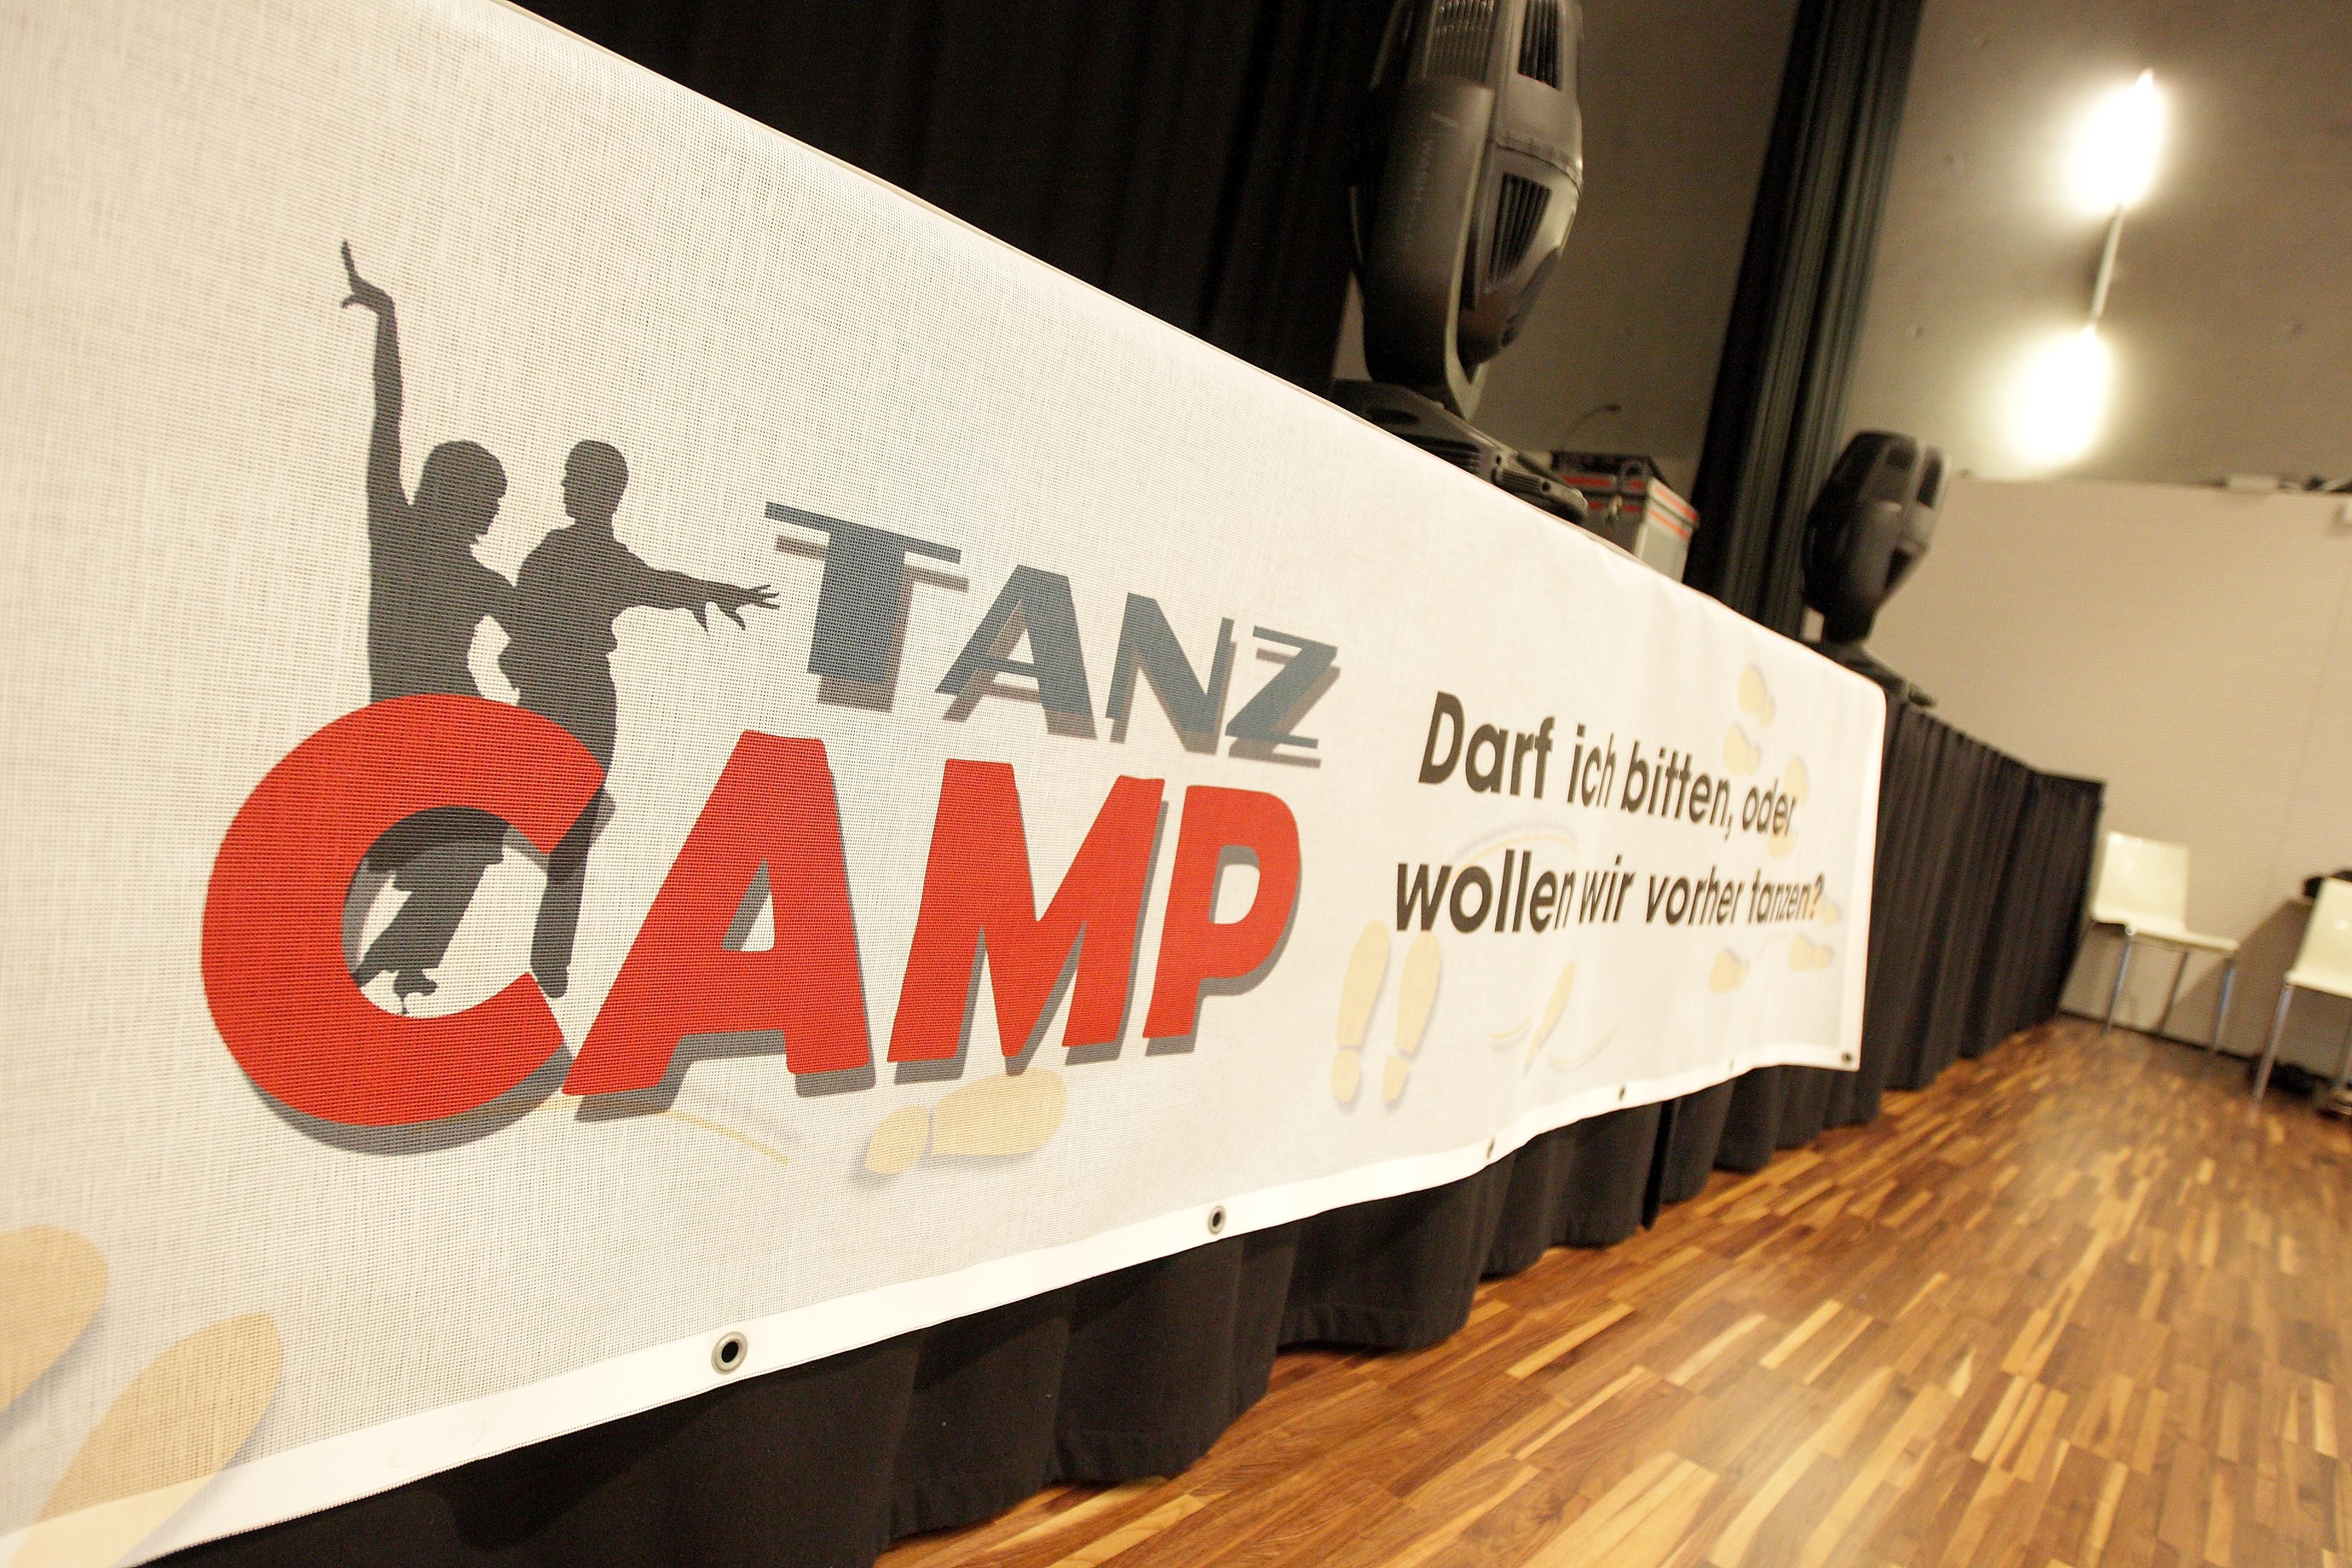 Sch-Tanzcamp-13052010-8fertig